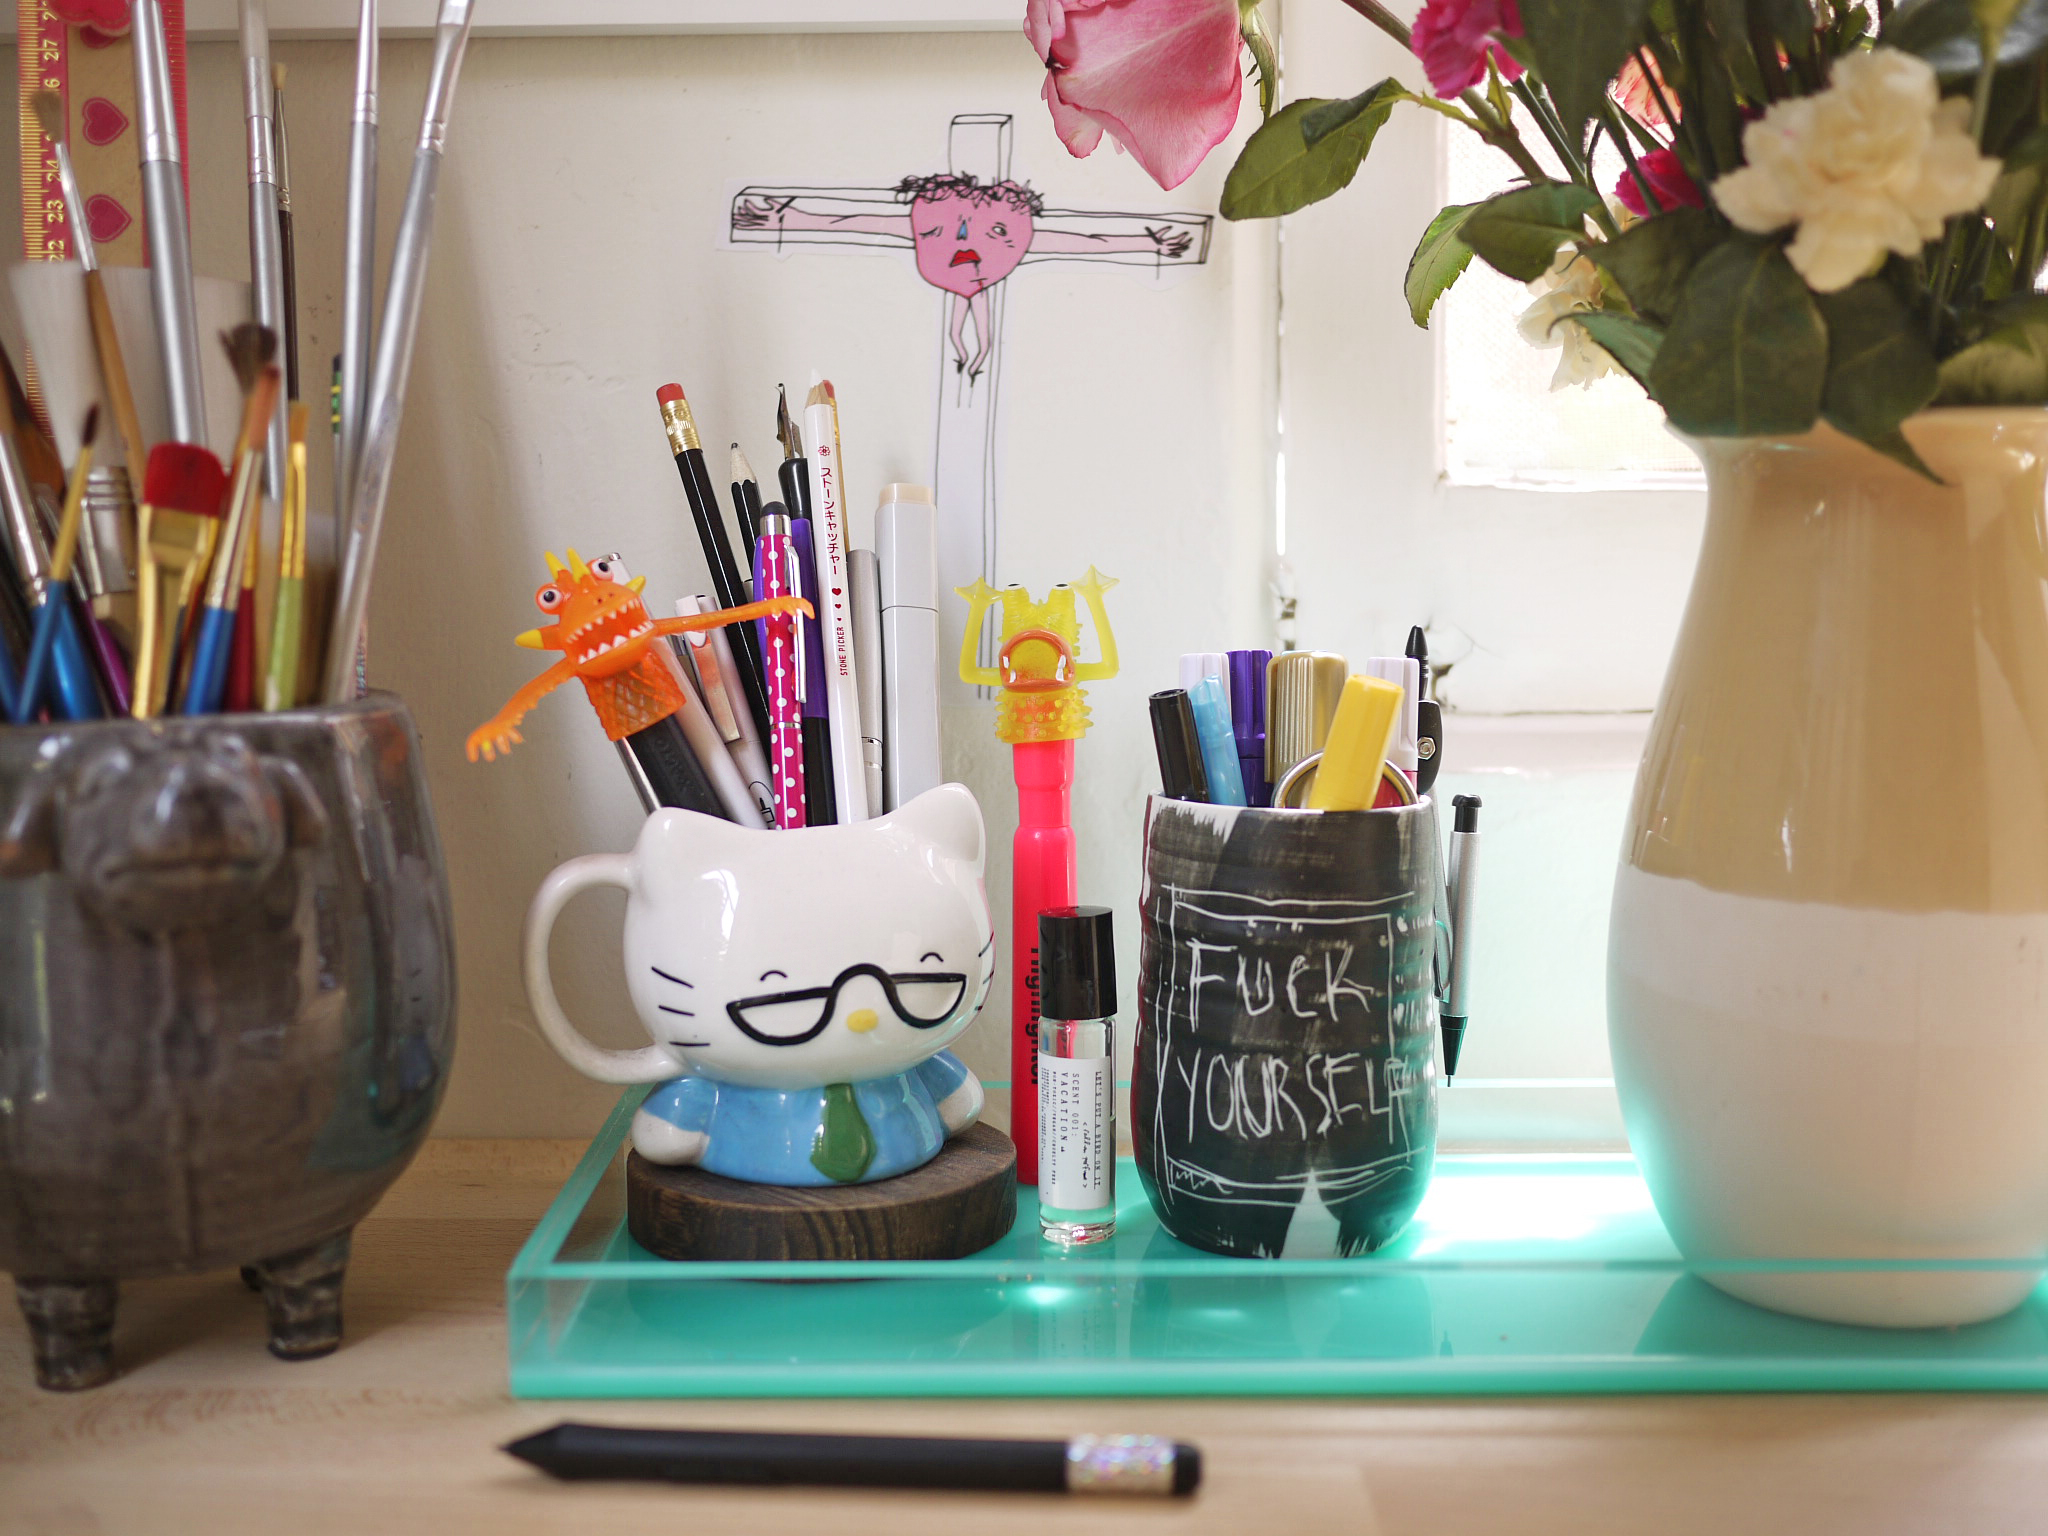 FUCK YOURSELF mug by ceramics + theory.